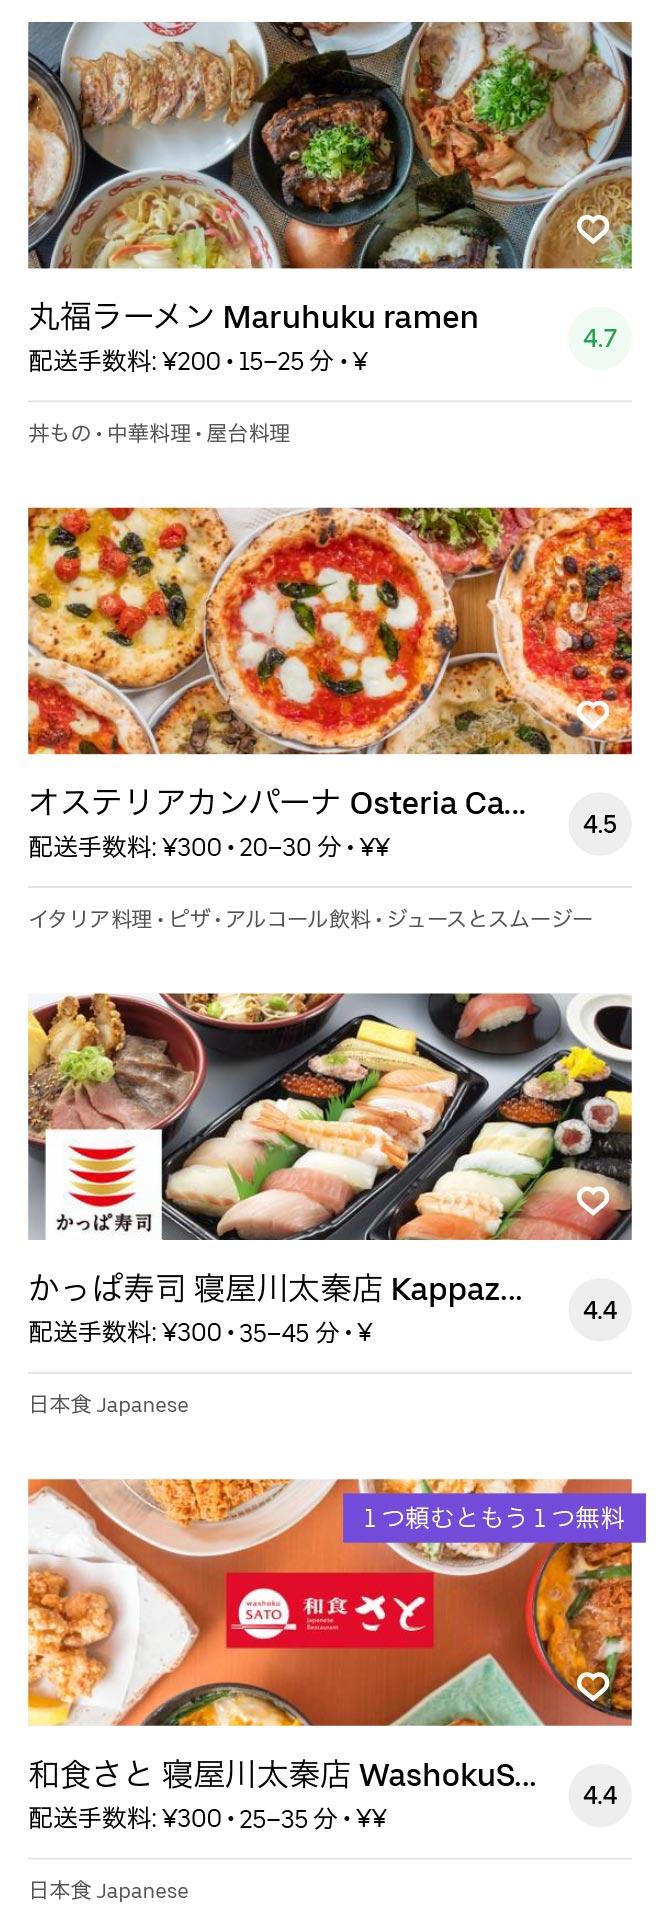 Neyagawa kourien menu 2006 07